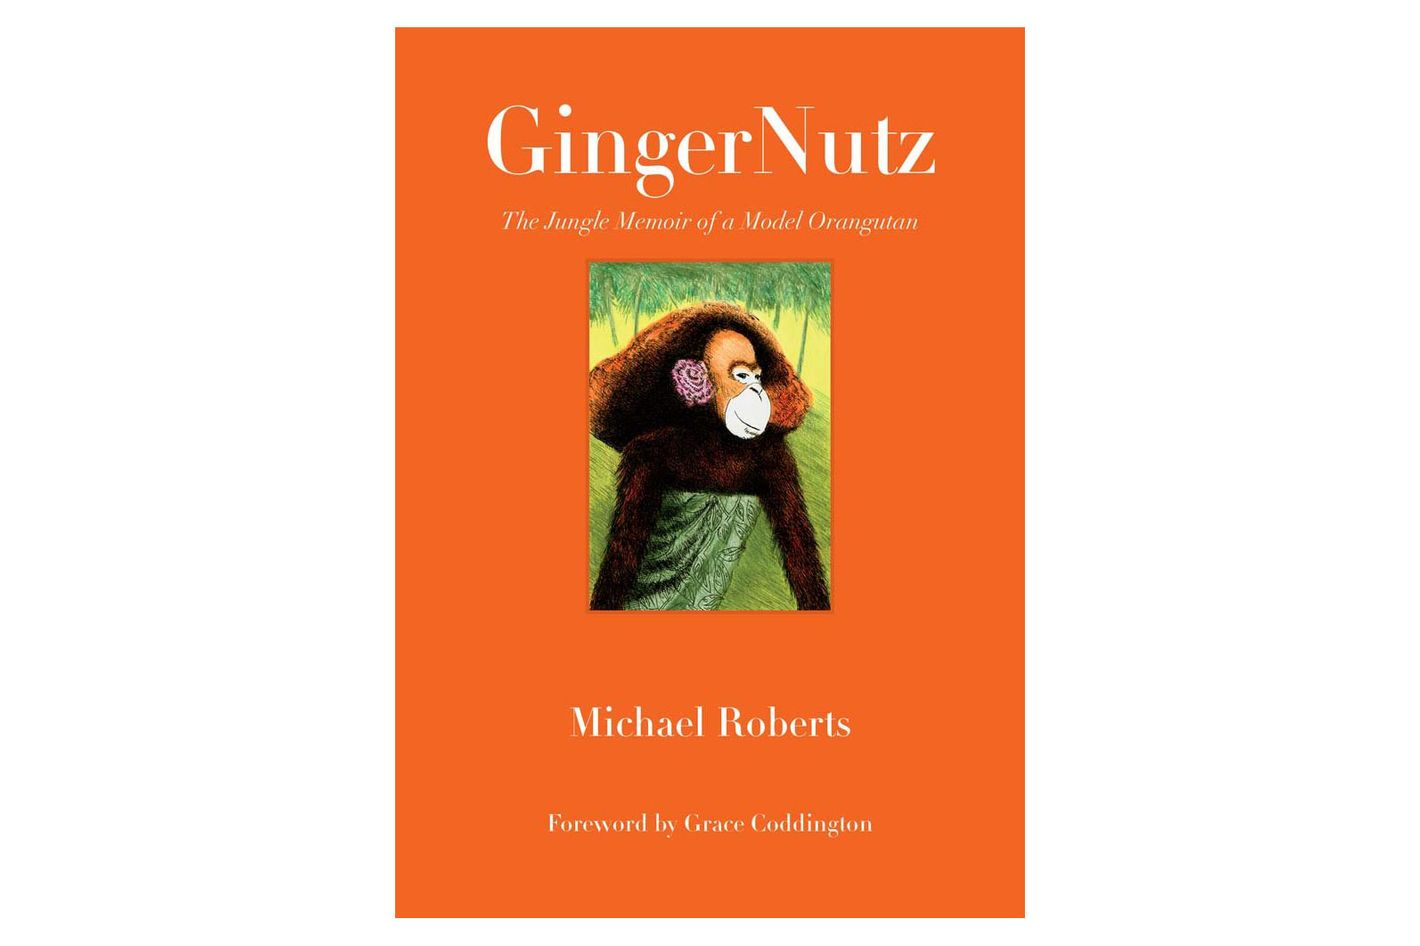 GingerNutz: The Jungle Memoir of a Model Orangutan